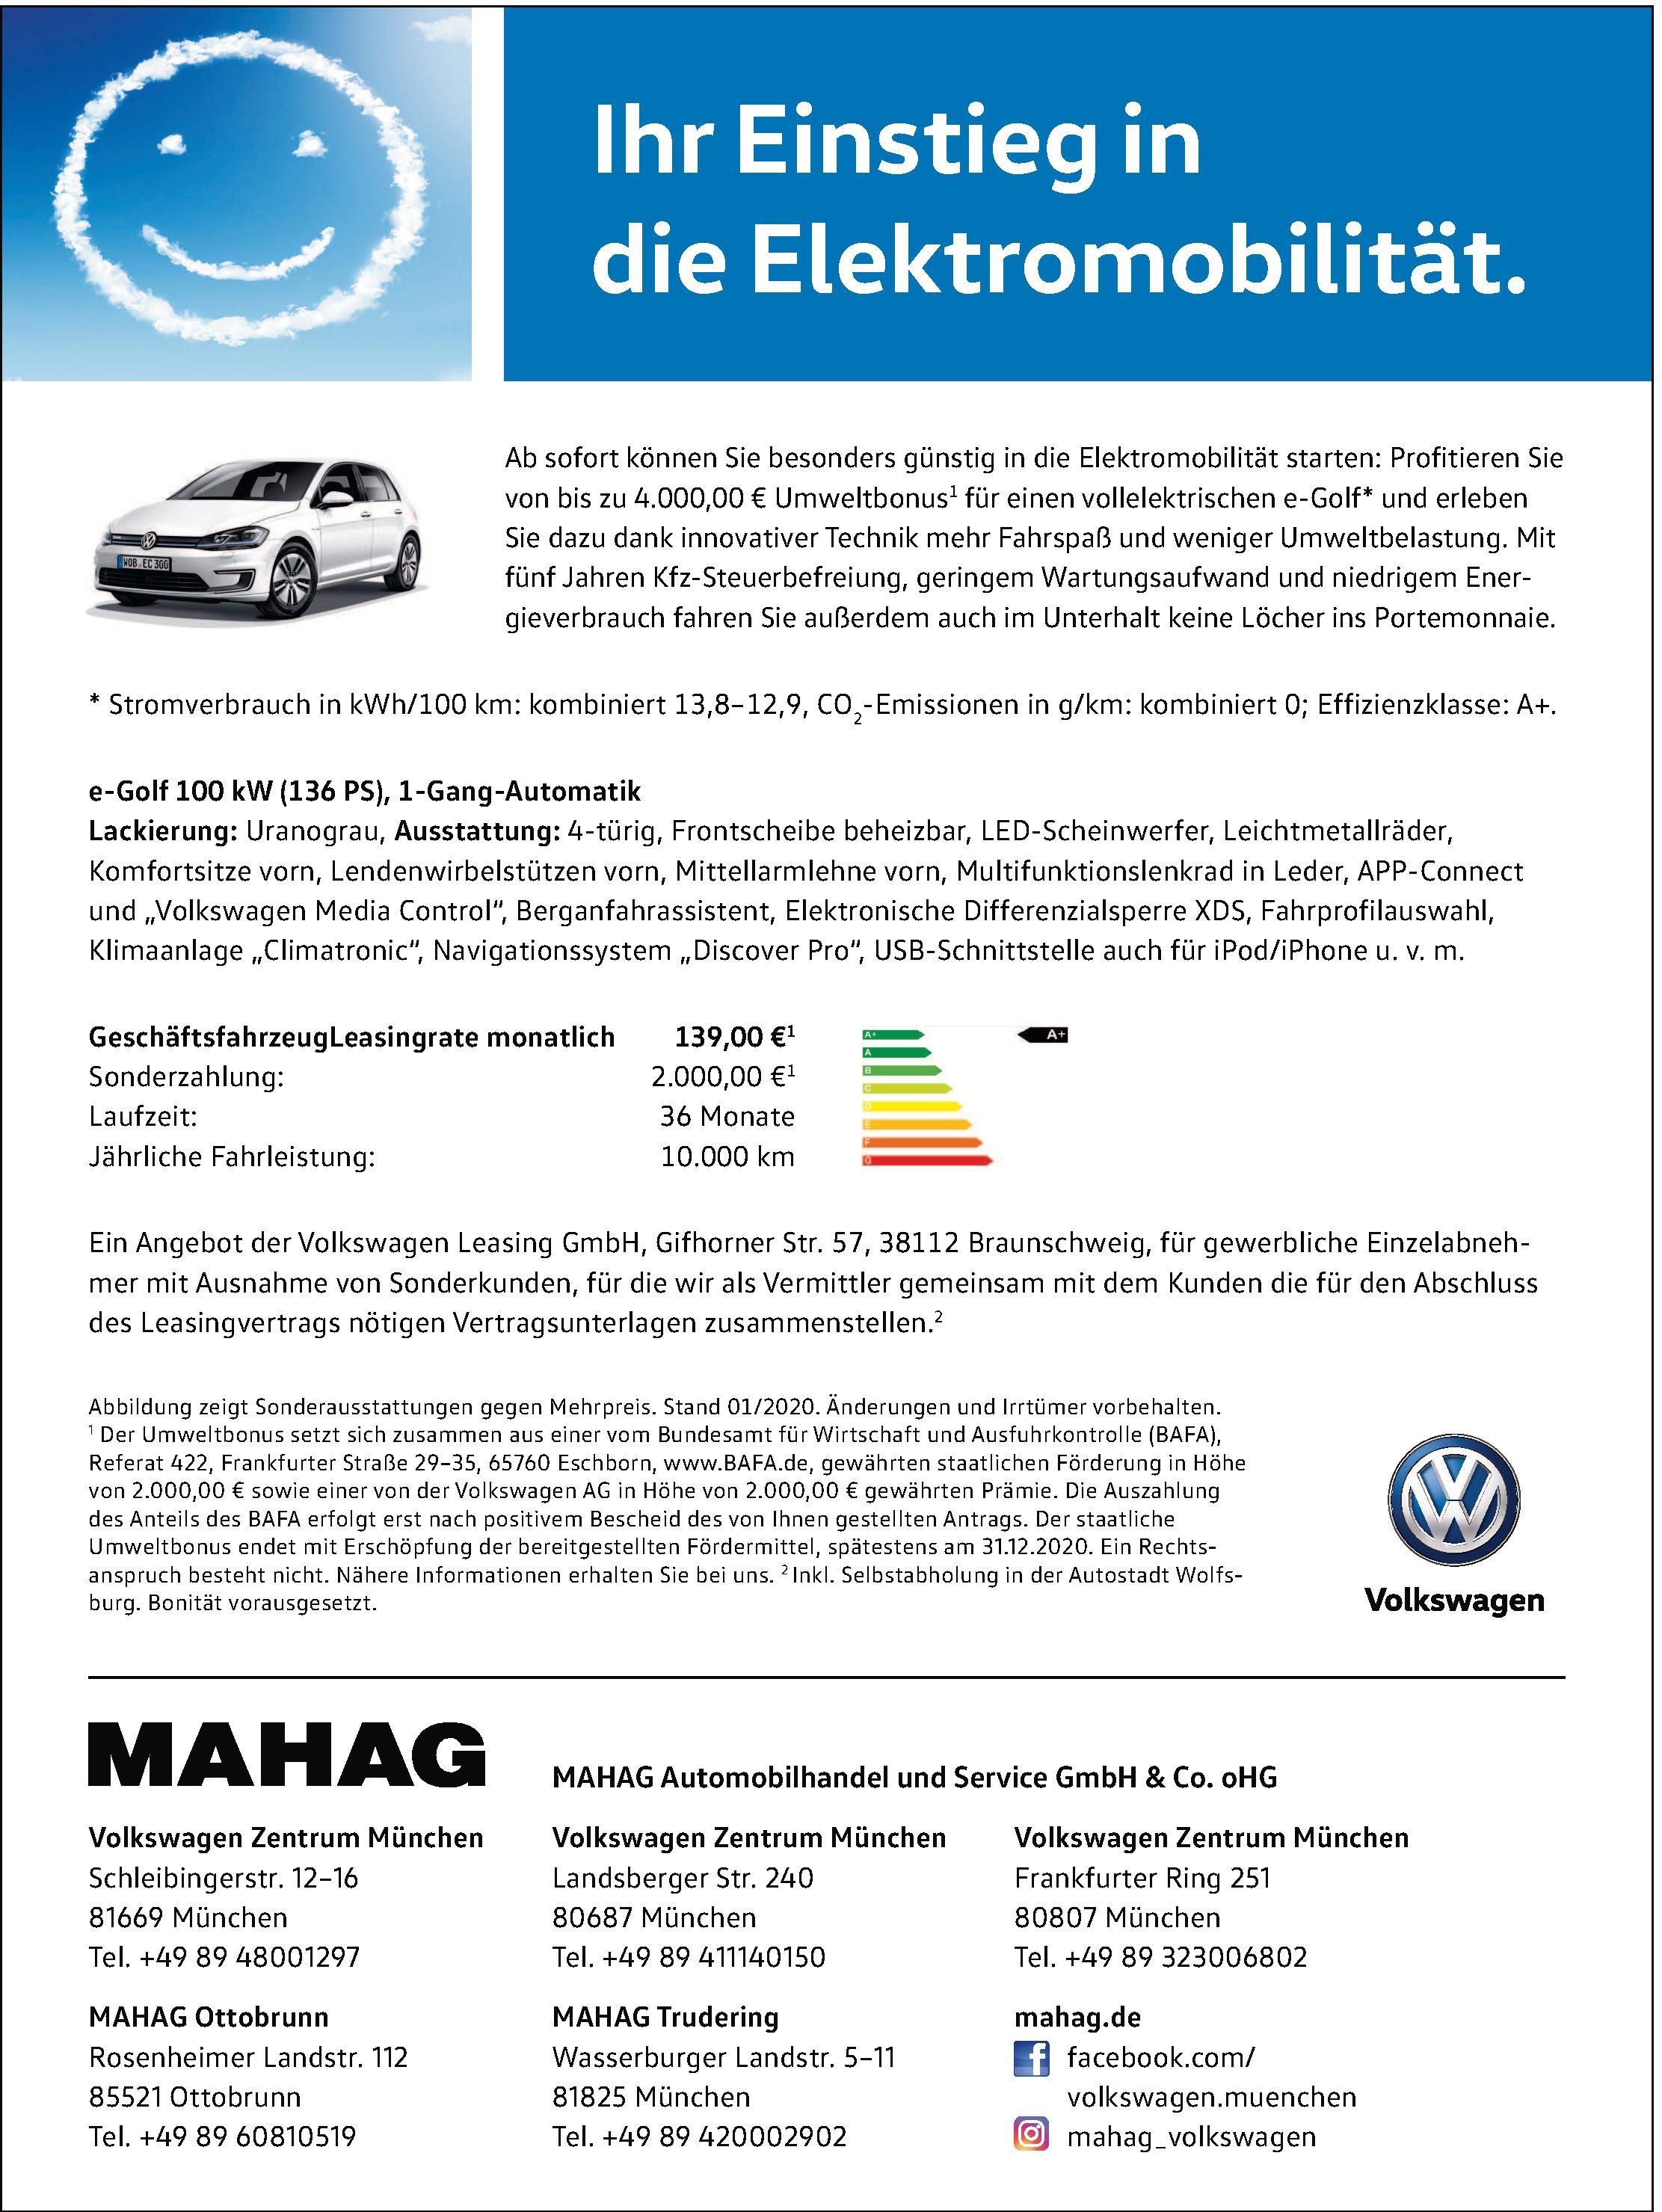 <br><b>MAHAG Automobilhandel und Service GmbH & Co. oHG<br></b> <br><b>Volkswagen Zentrum München</b> <p></p> Schleibingerstr. 12-16 <p></p> 81669 München <p></p> Tel. +49 89 48001297 <p></p> <a href='https://mahag.de'>www.mahag.de</a> </p> <hr> <br><b> MAHAG Ottobrunn</b> <p></p> Rosenheimer Landstr. 112 <p></p> 85521 Ottobrunn <p></p> Tel. +49 89 60810519 </p> <hr> <br><b>Volkswagen Zentrum München</b> <p></p> Landsberger Str. 240 <p></p> 80687 München <p></p> Tel. +49 89 411140150 </p> <hr> <br><b>MAHAG Trudering</b> <p></p> Wasserburger Landstr. 5-11 <p></p> 81825 München <p></p> Tel. +49 89 420002902 </p> <hr> <br><b>Volkswagen Zentrum München</b> <p></p> Frankfurter Ring 251 <p></p> 80807 München <p></p> Tel. +49 89 323006802 </p>